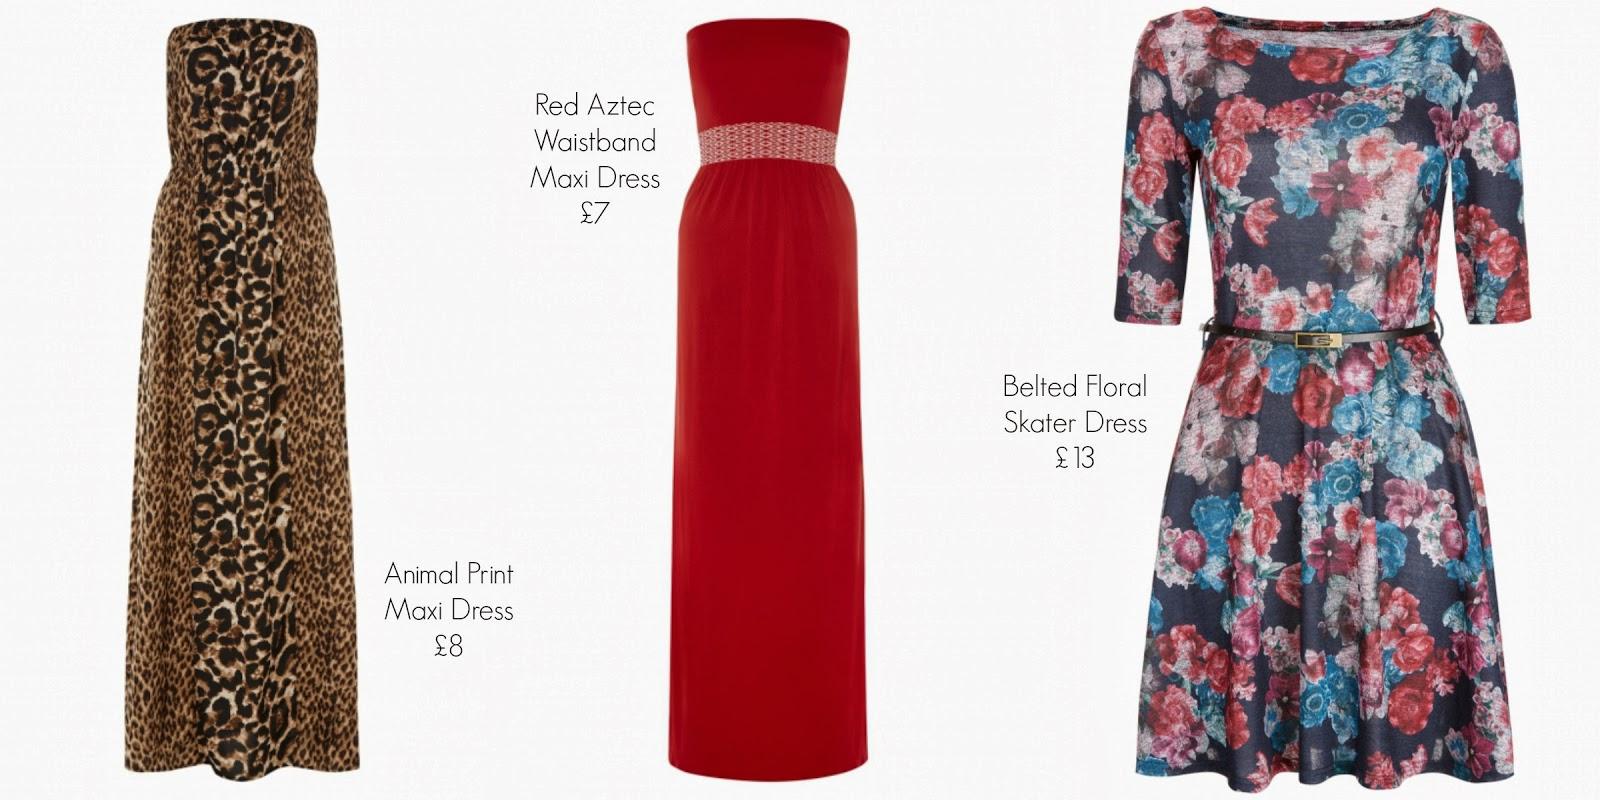 Primark-SS14-Dresses